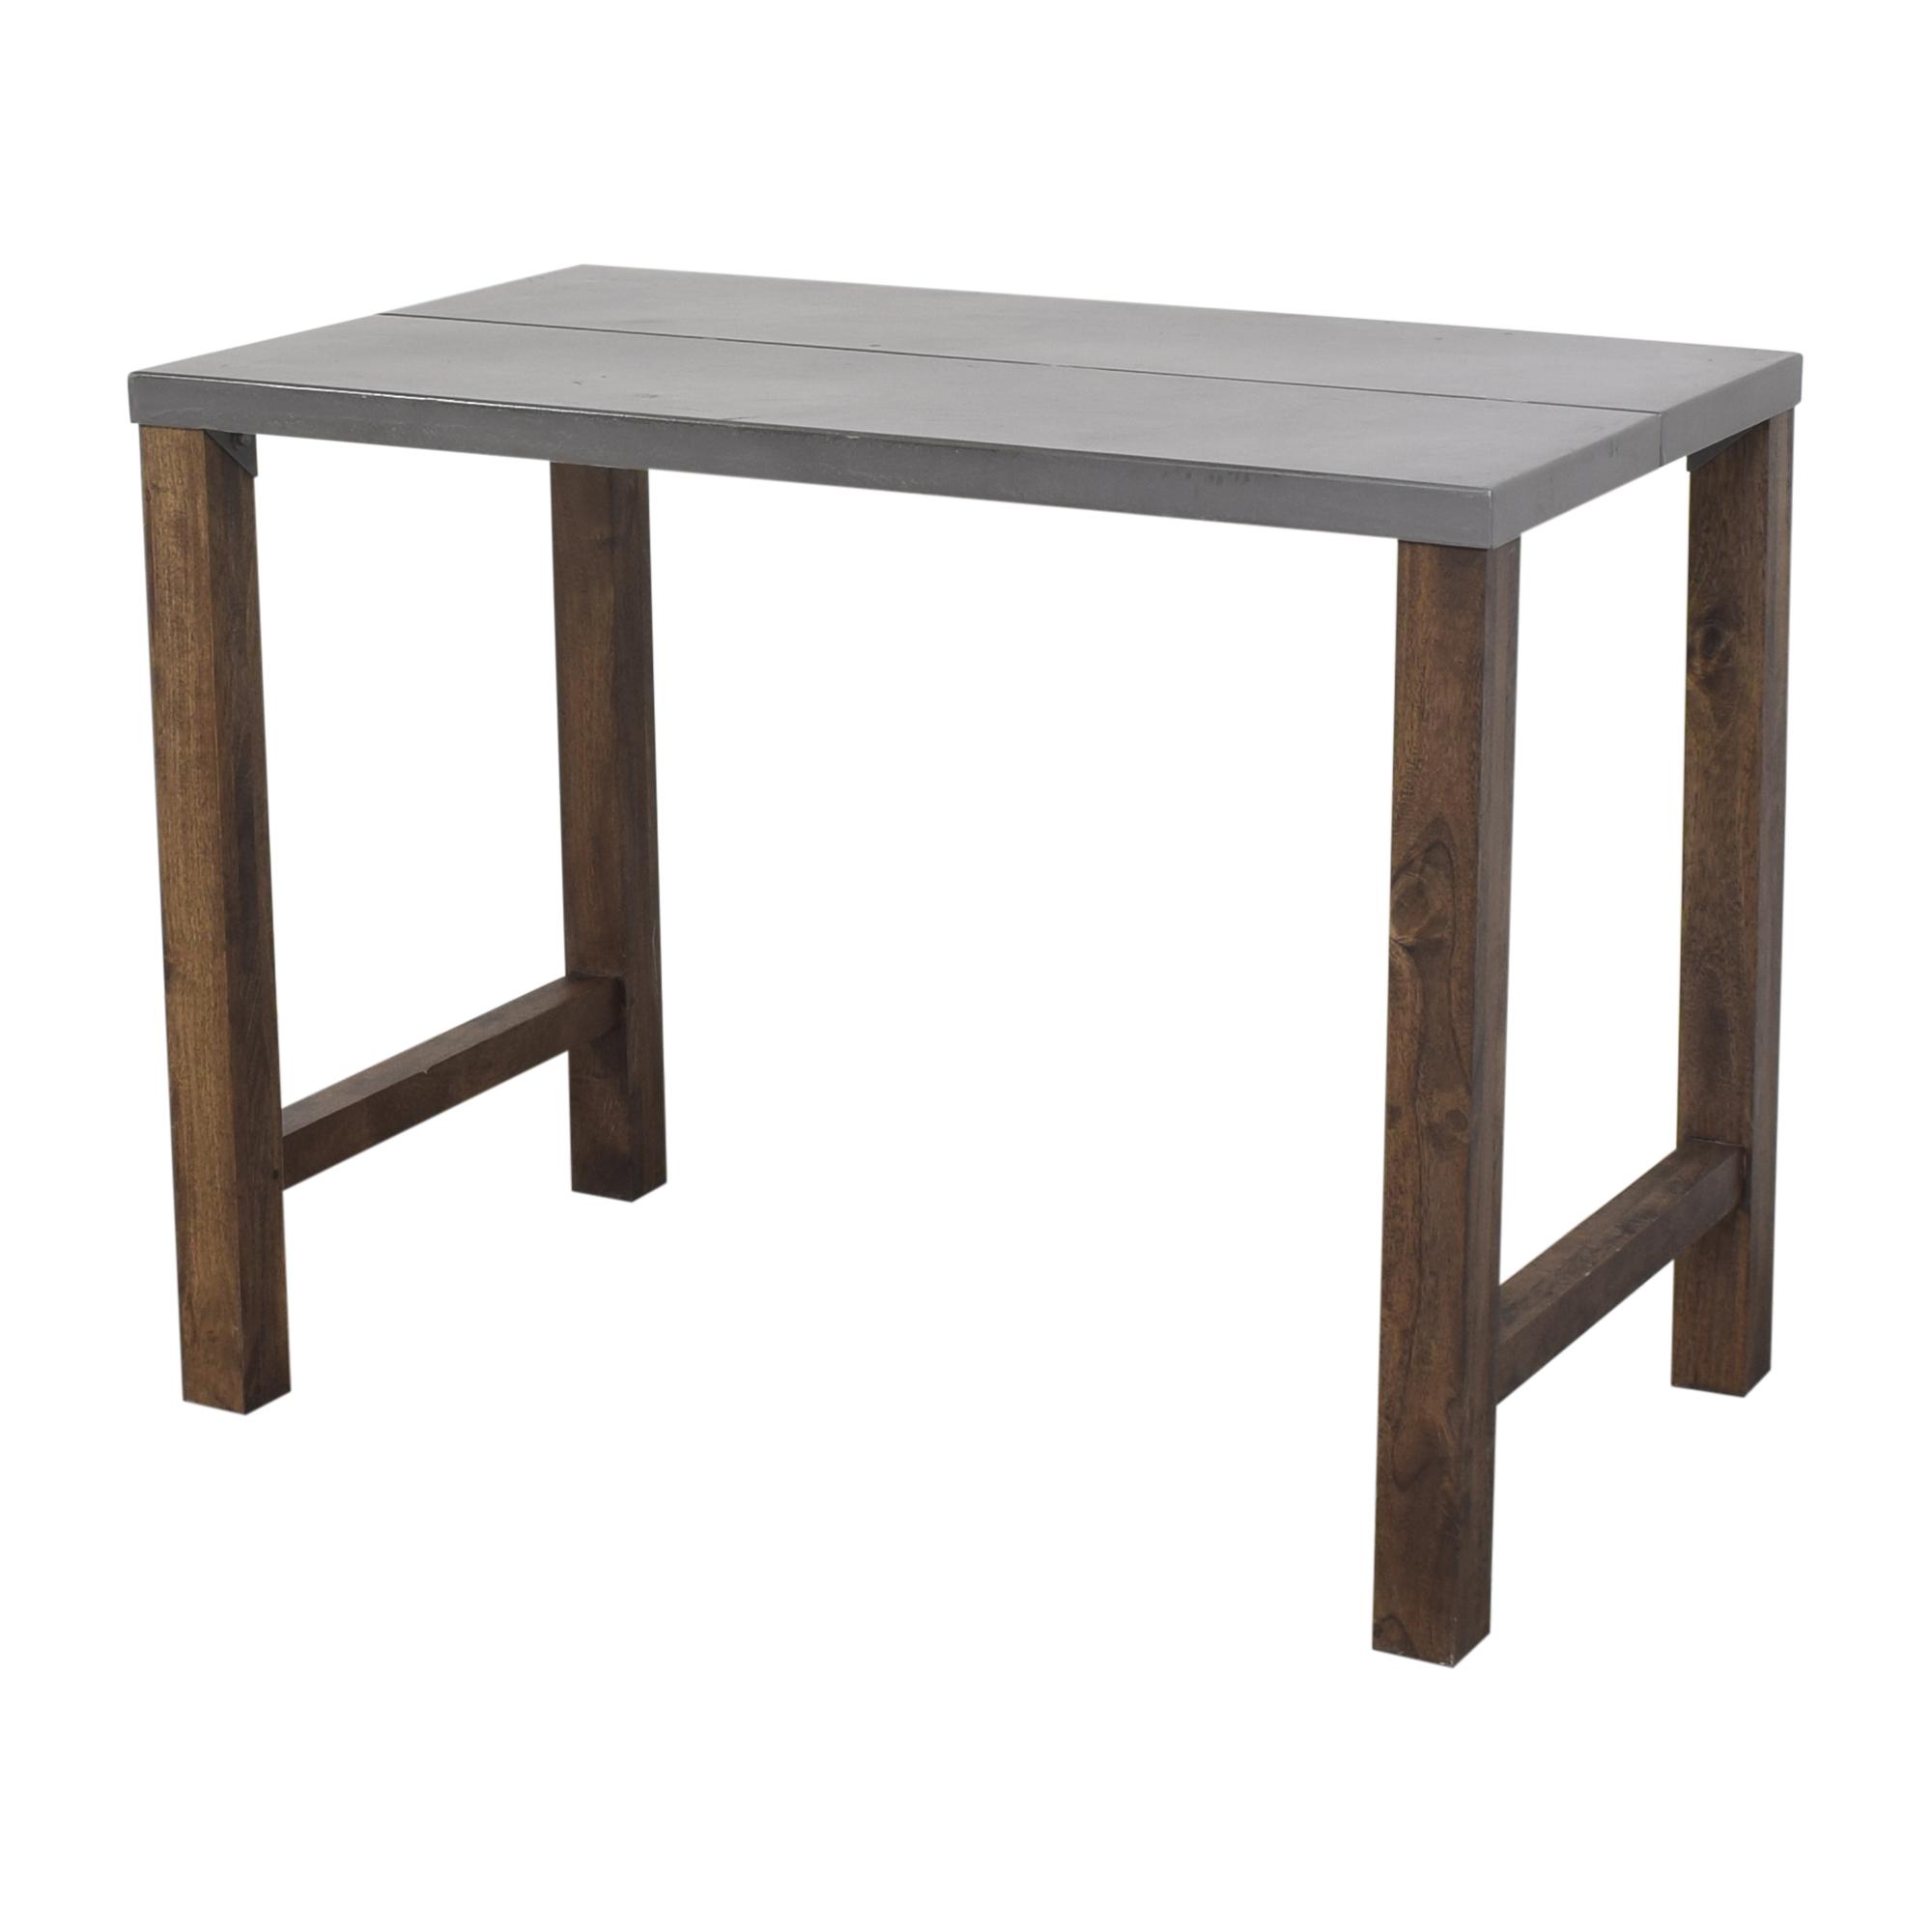 shop Crate & Barrel Crate & Barrel Counter Height Table online